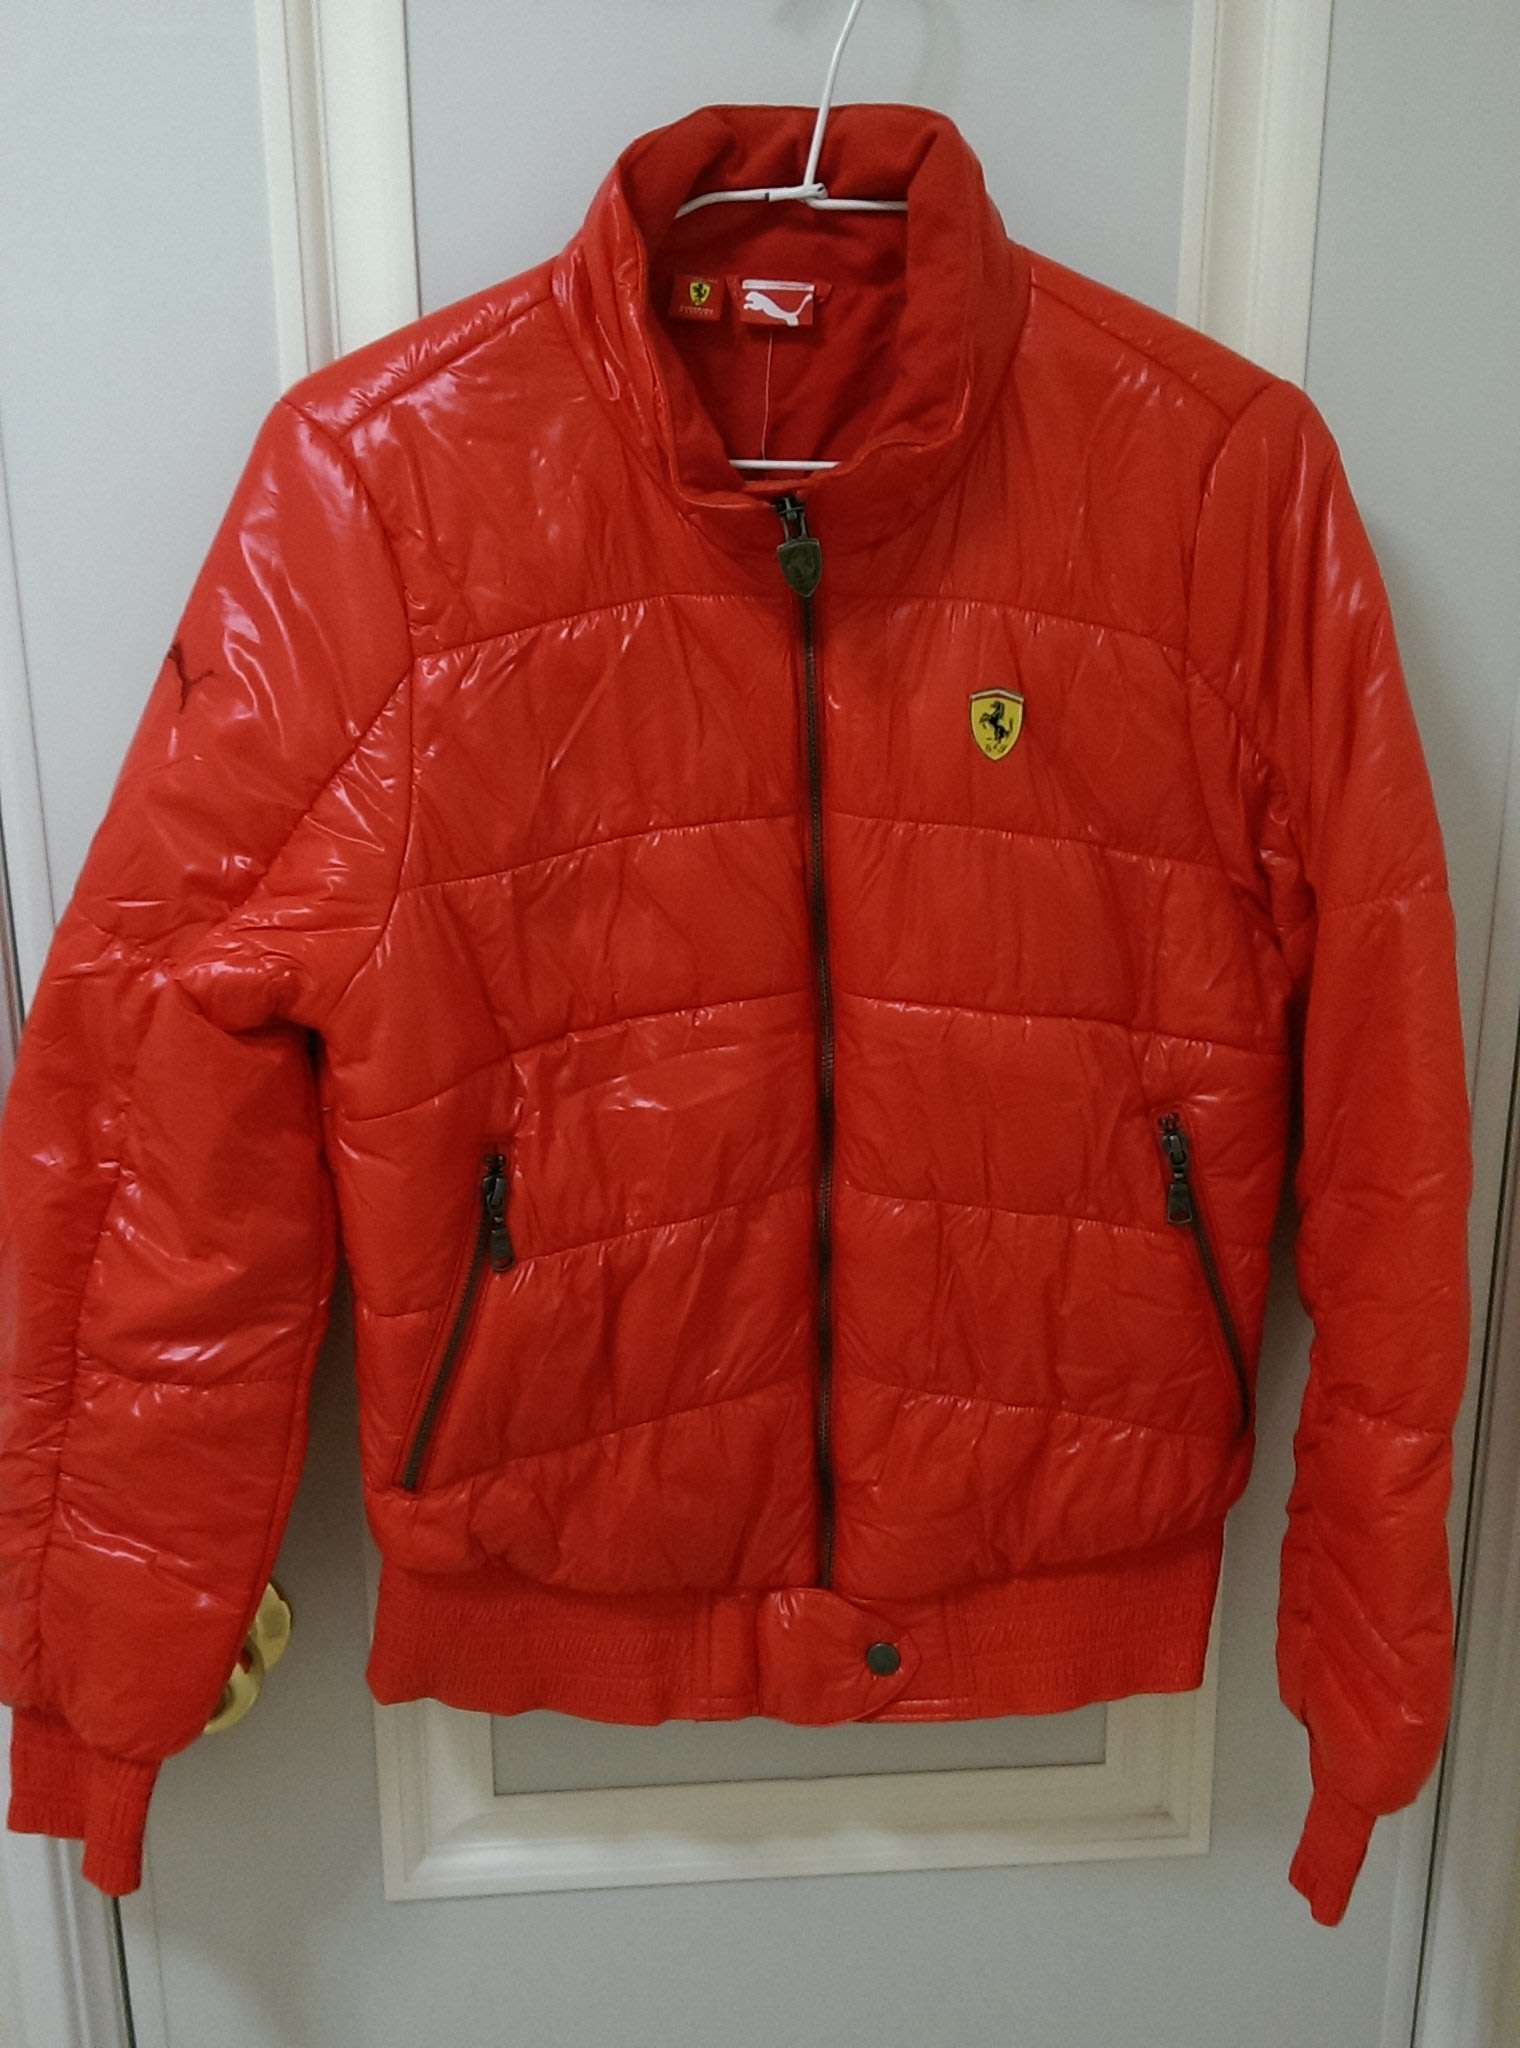 [PUMA] 法拉利Ferrari休閒鋪棉外套